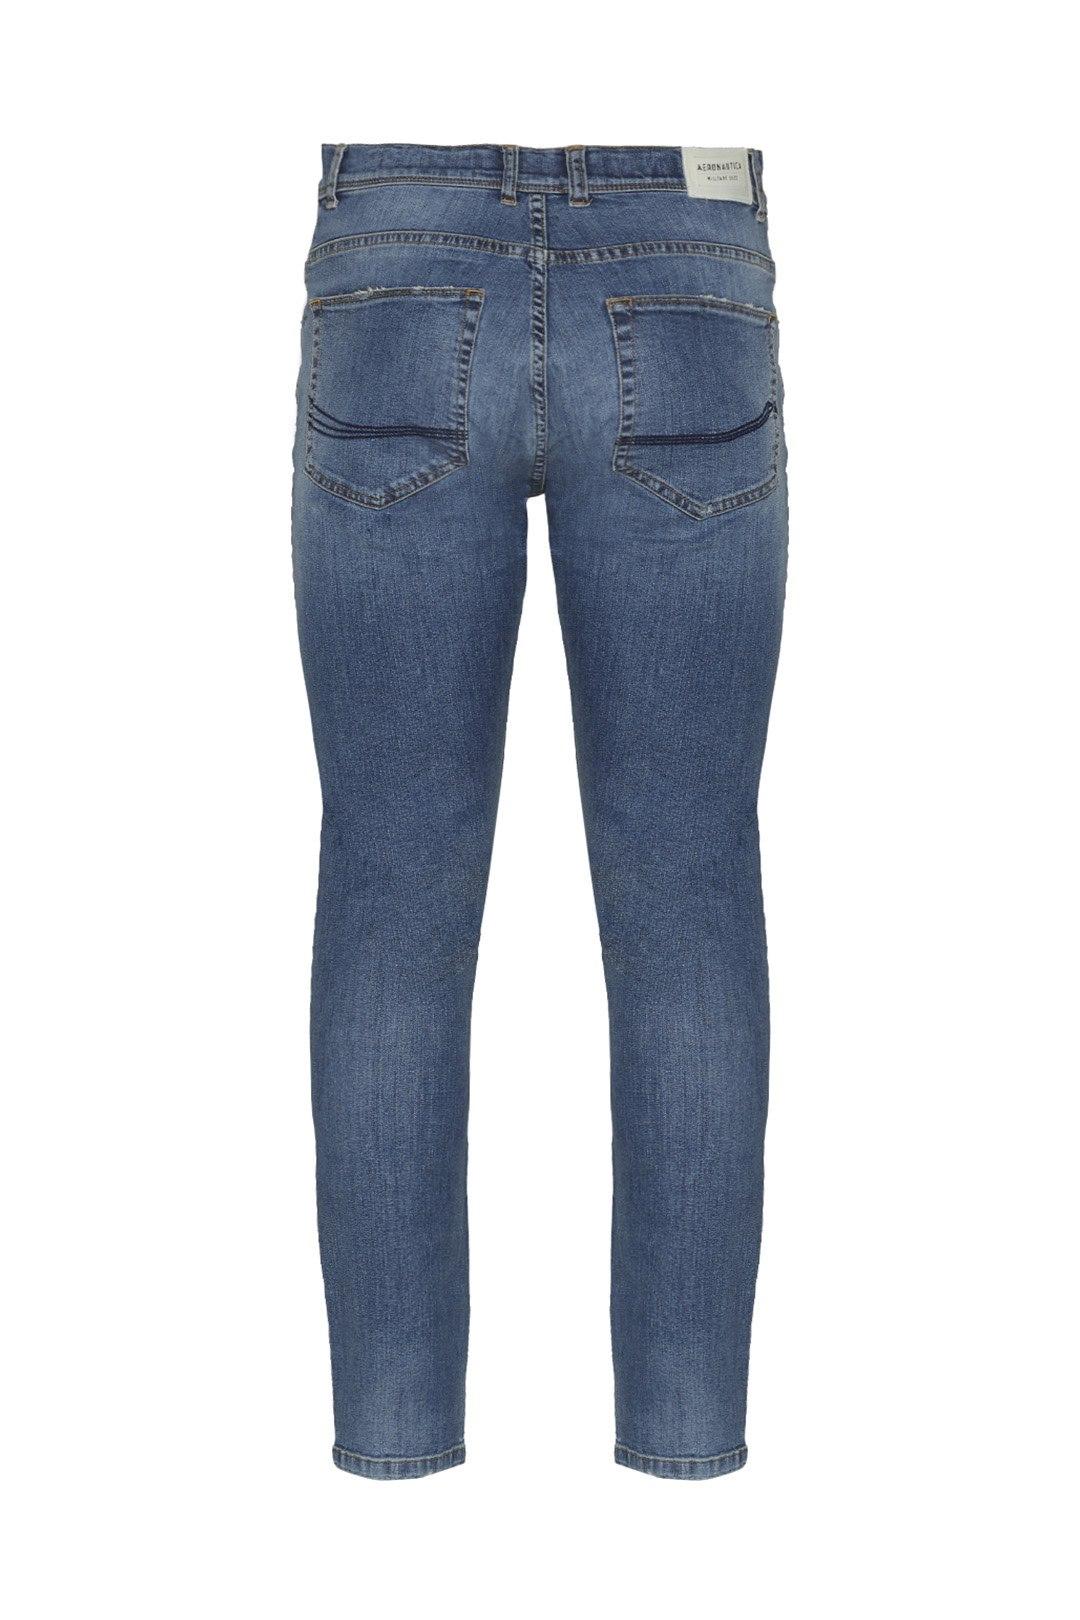 5-pockets denim trousers                 2